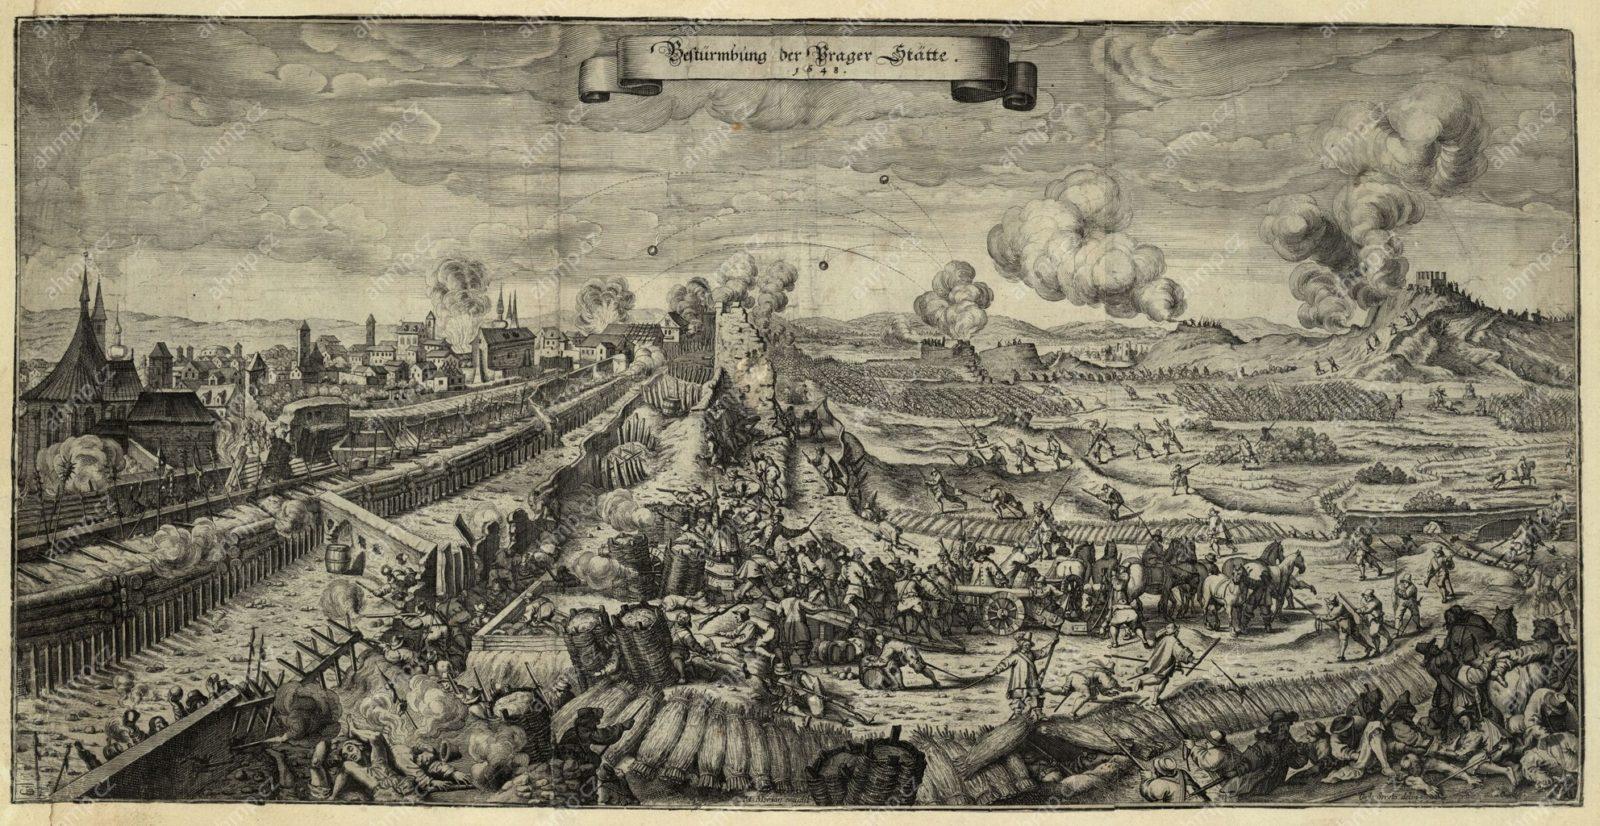 Karel Škréta, Obléhání měst pražských v roce 1648 Švédy, mědiryt, Frankfurt am Main: Matthaeus Merian Erben, 1652, AMP, Sbírka grafiky, G 32a, G 3745